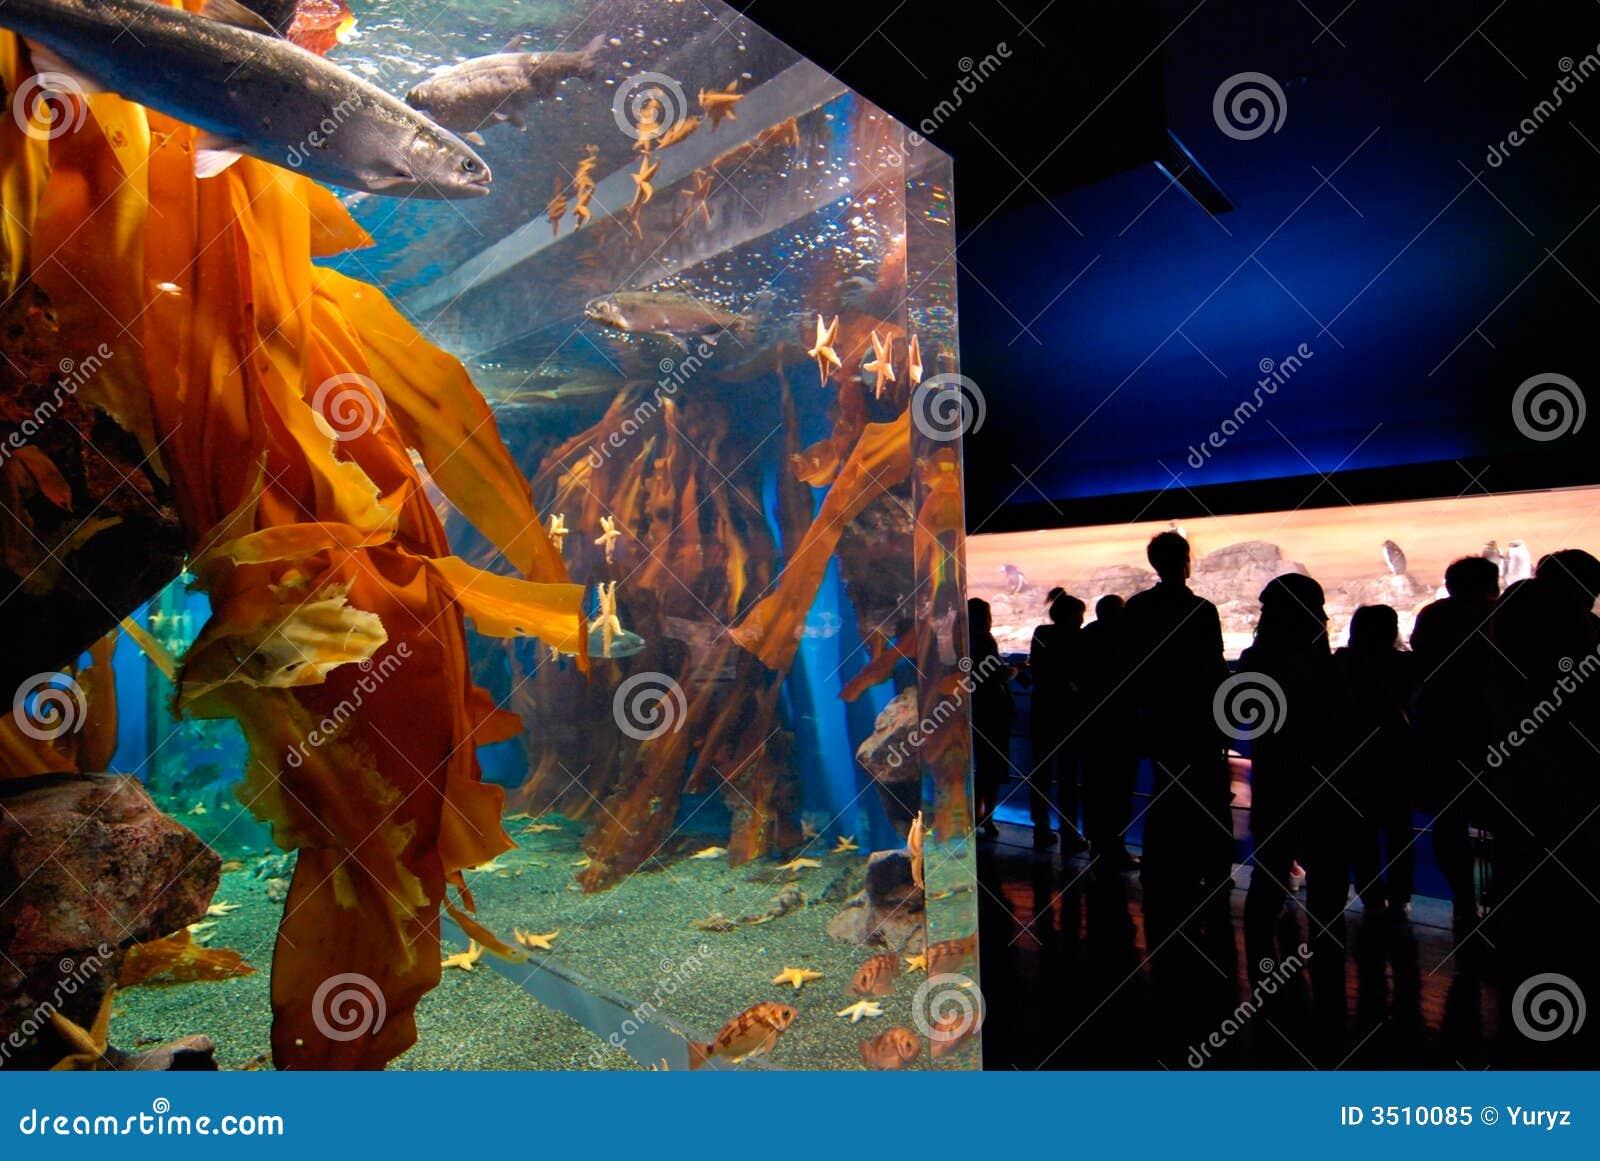 Aquarium And Public Royalty Free Stock Photo Image 3510085